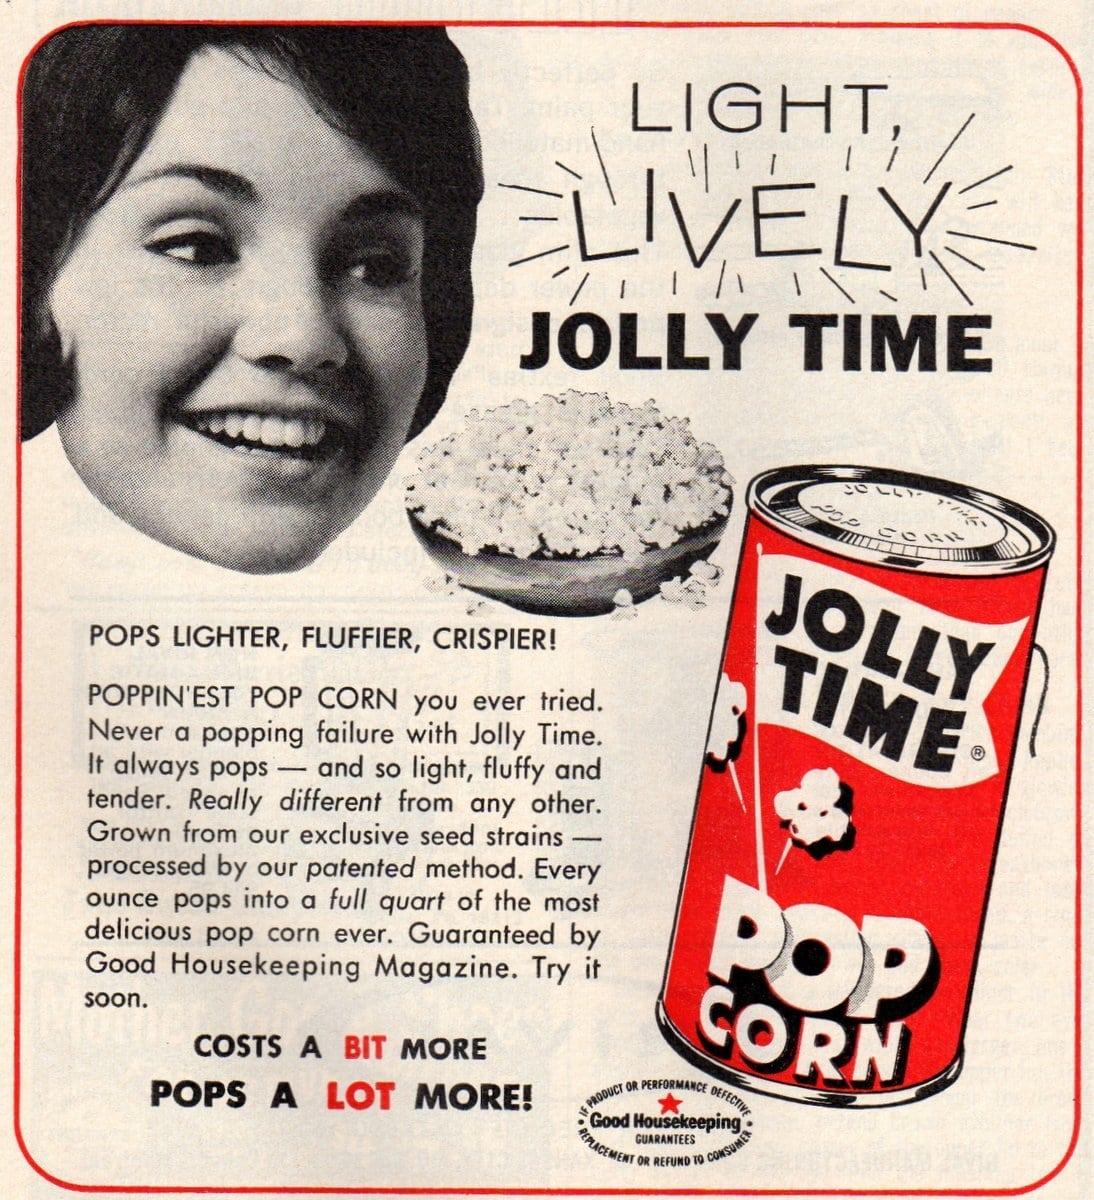 Jolly Time Pop Corn (1965)